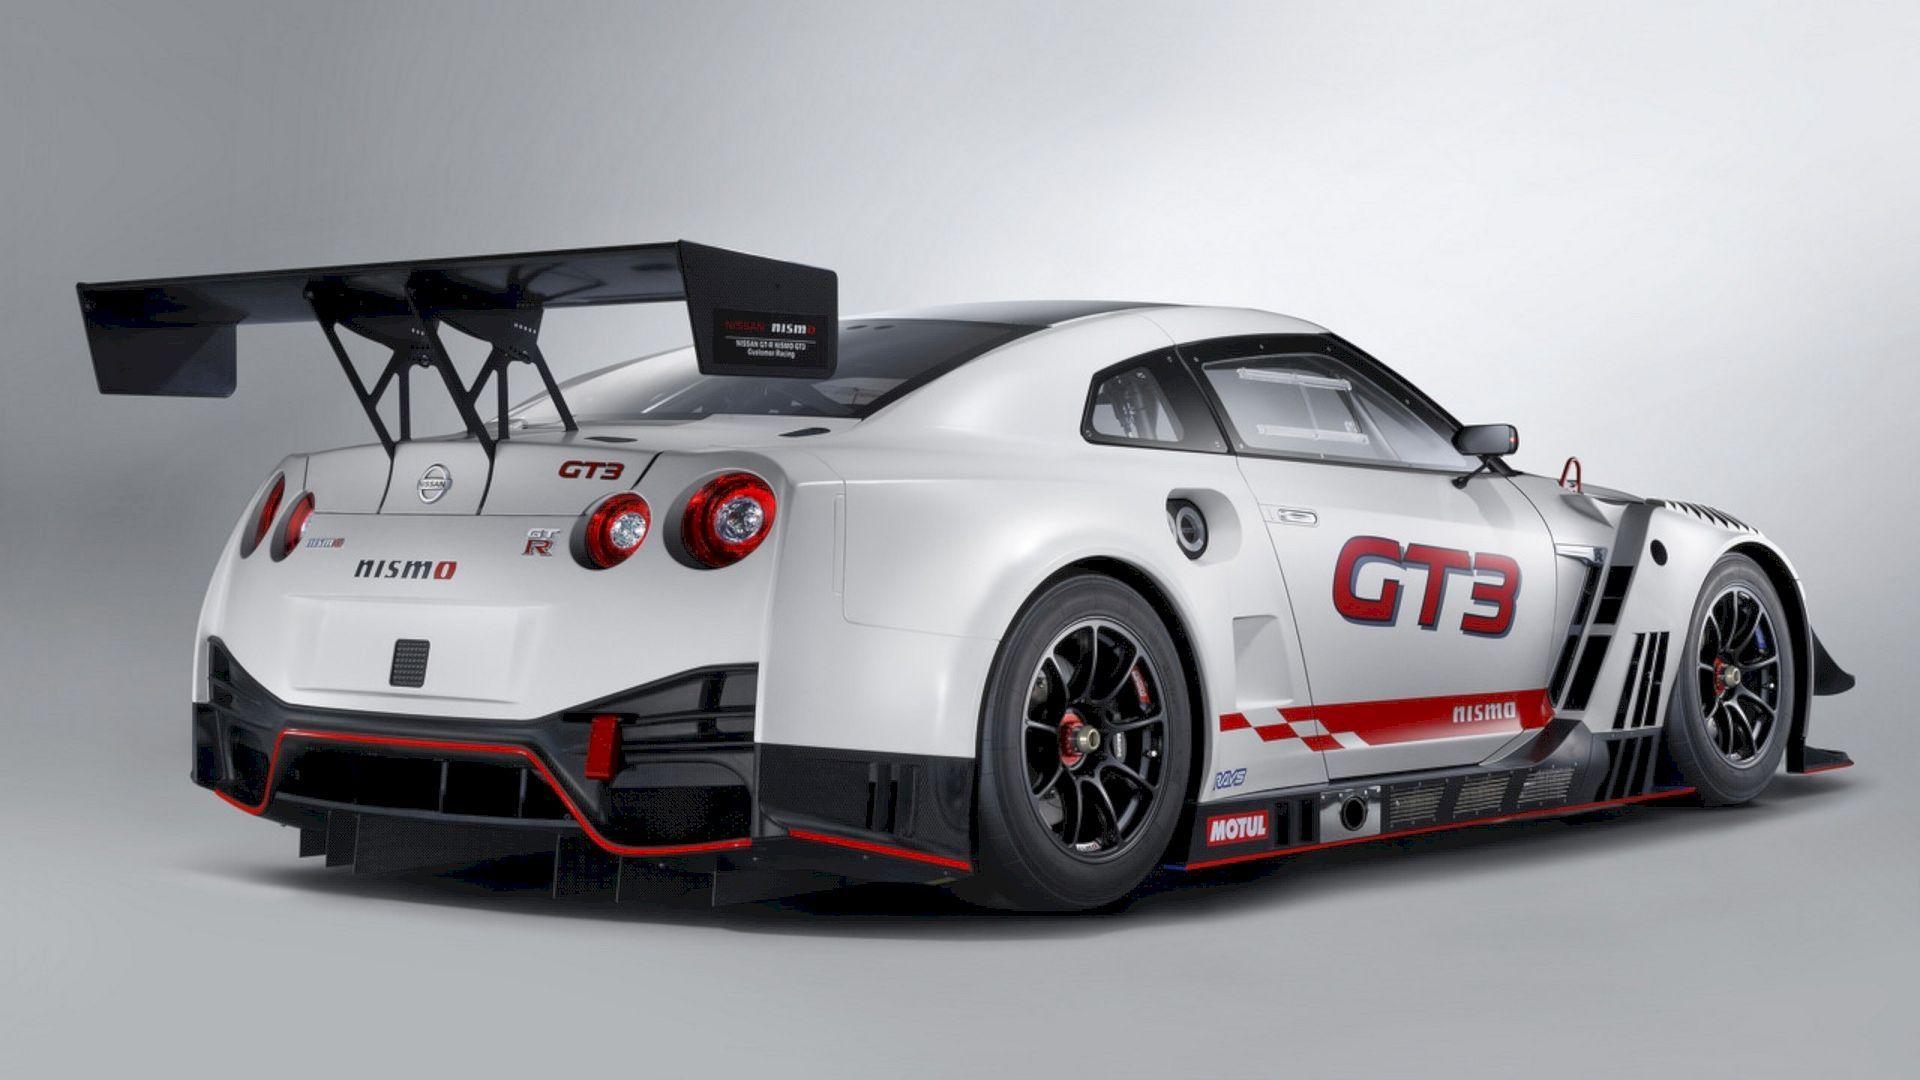 2018 Nissan Gt R Nismo Gt3 Top Of The Top Nissan Gtr Nismo Nissan Gtr Gtr Nismo